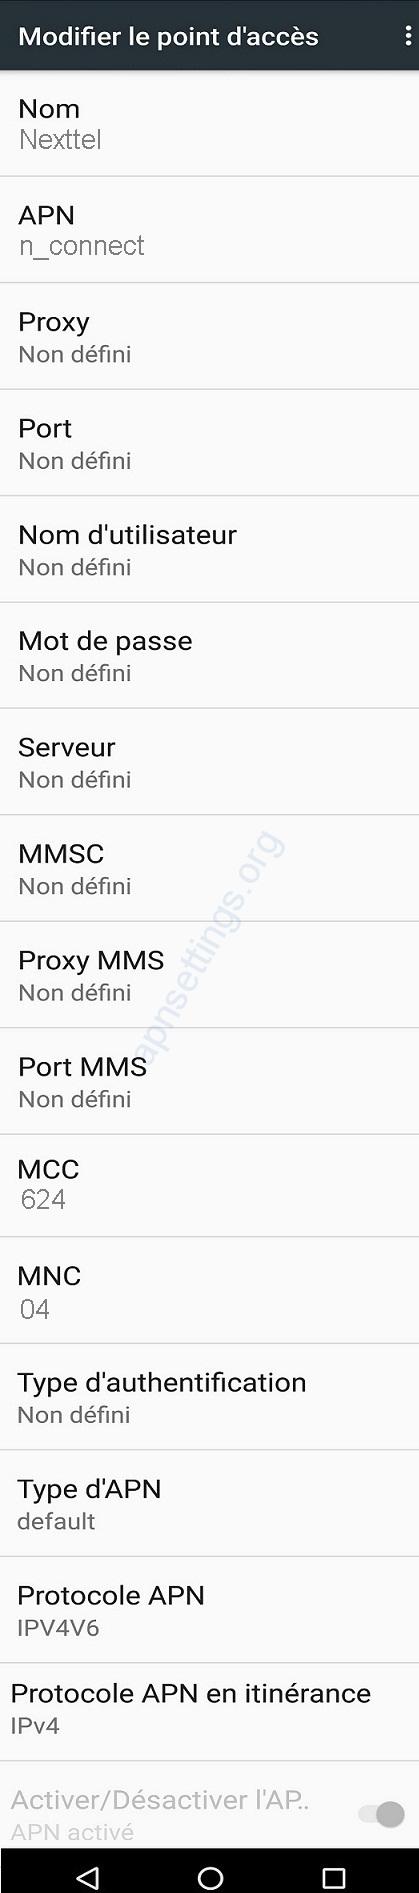 Paramètres Internet de Nexttel Cameroun